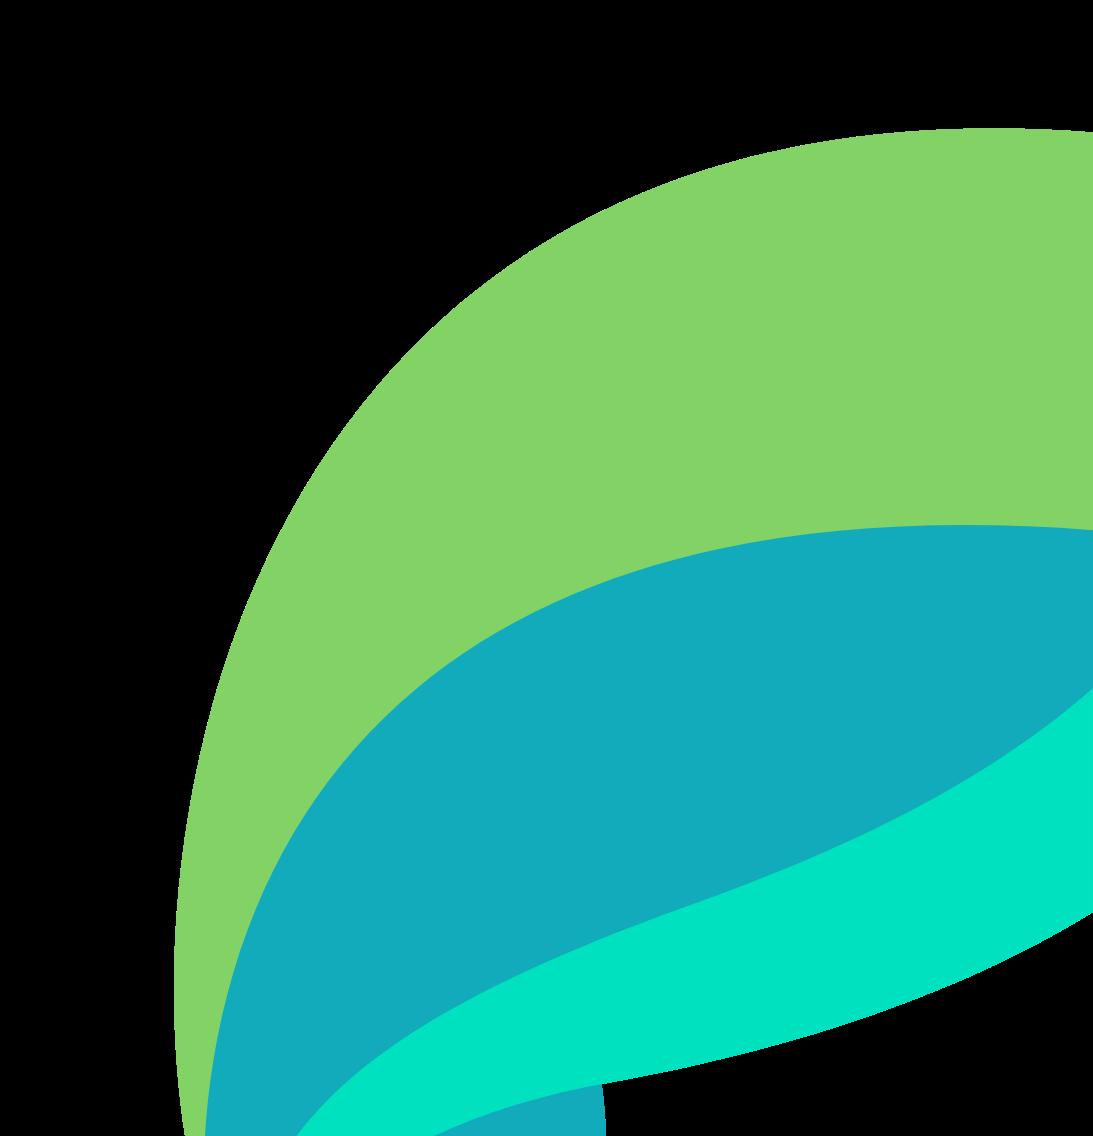 ParetoHealth logo close-up image.